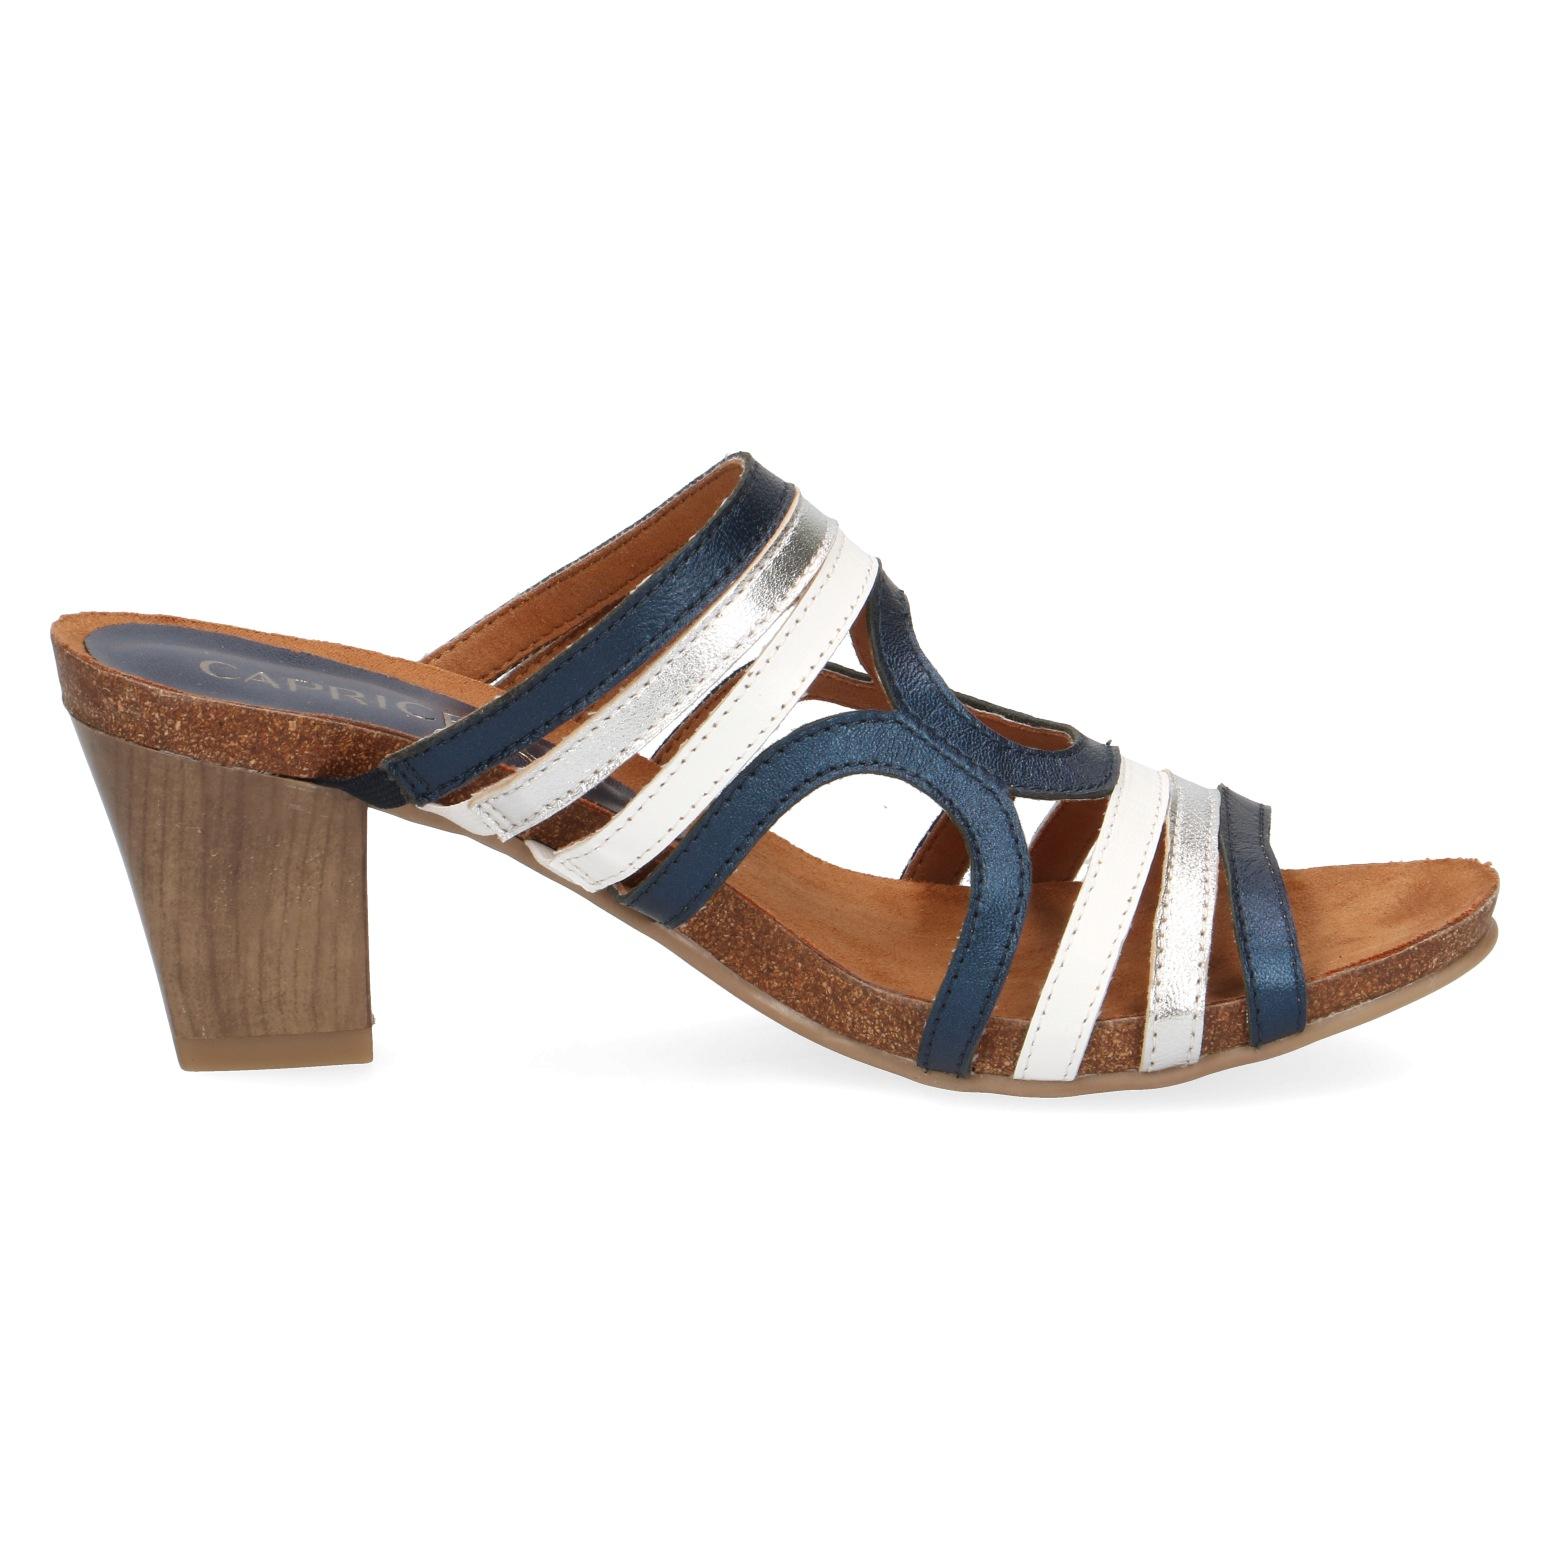 Caprice 9 27201 22 Schuhe Damen elegante Pantoletten Clogs